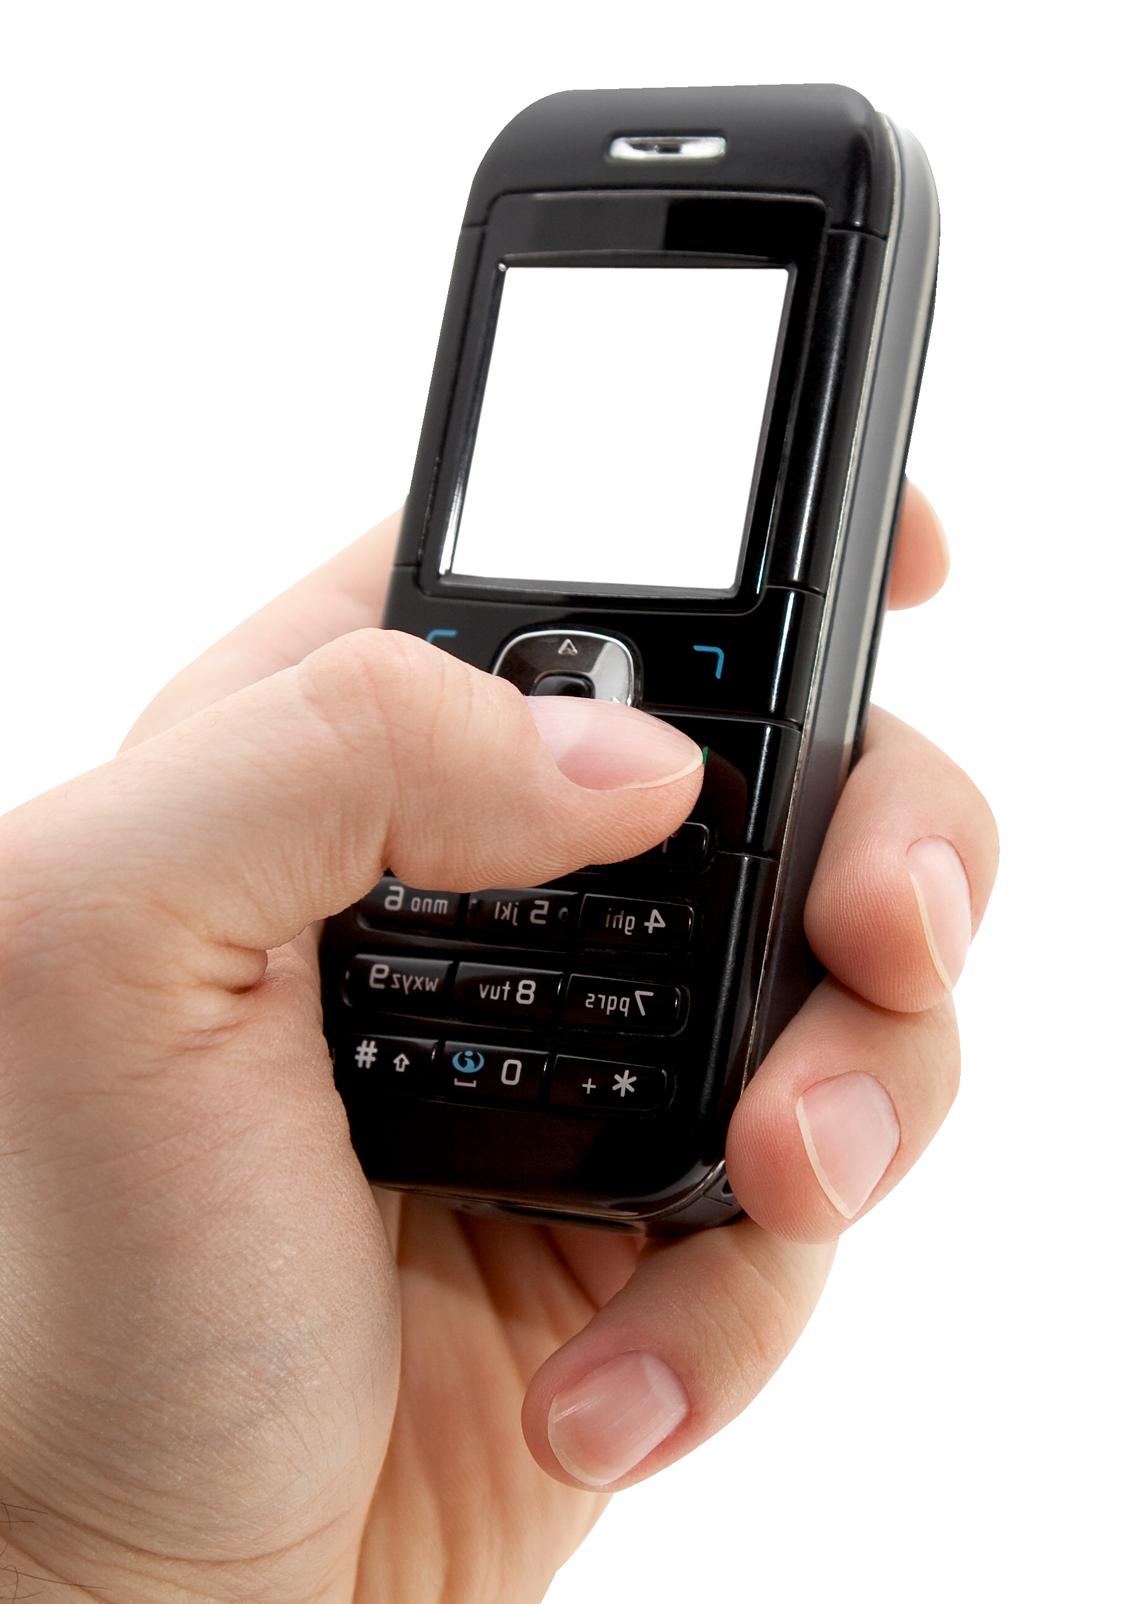 Analog Alarm Clock PNG Image Phone, Analog alarm clock